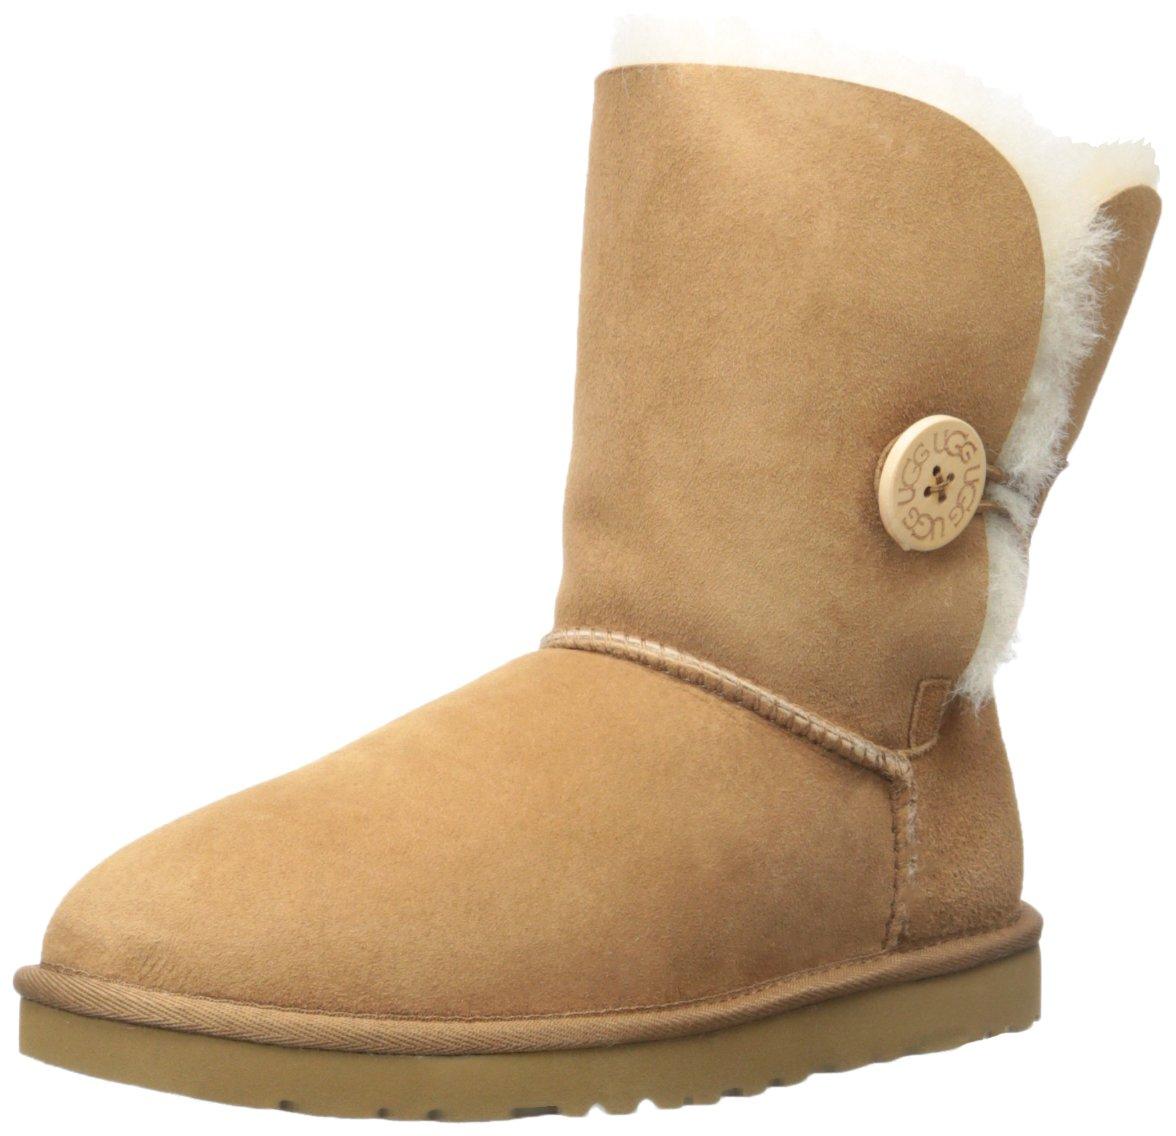 UGG Womens Bailey Button Chestnut Boot 5 B - Medium by UGG